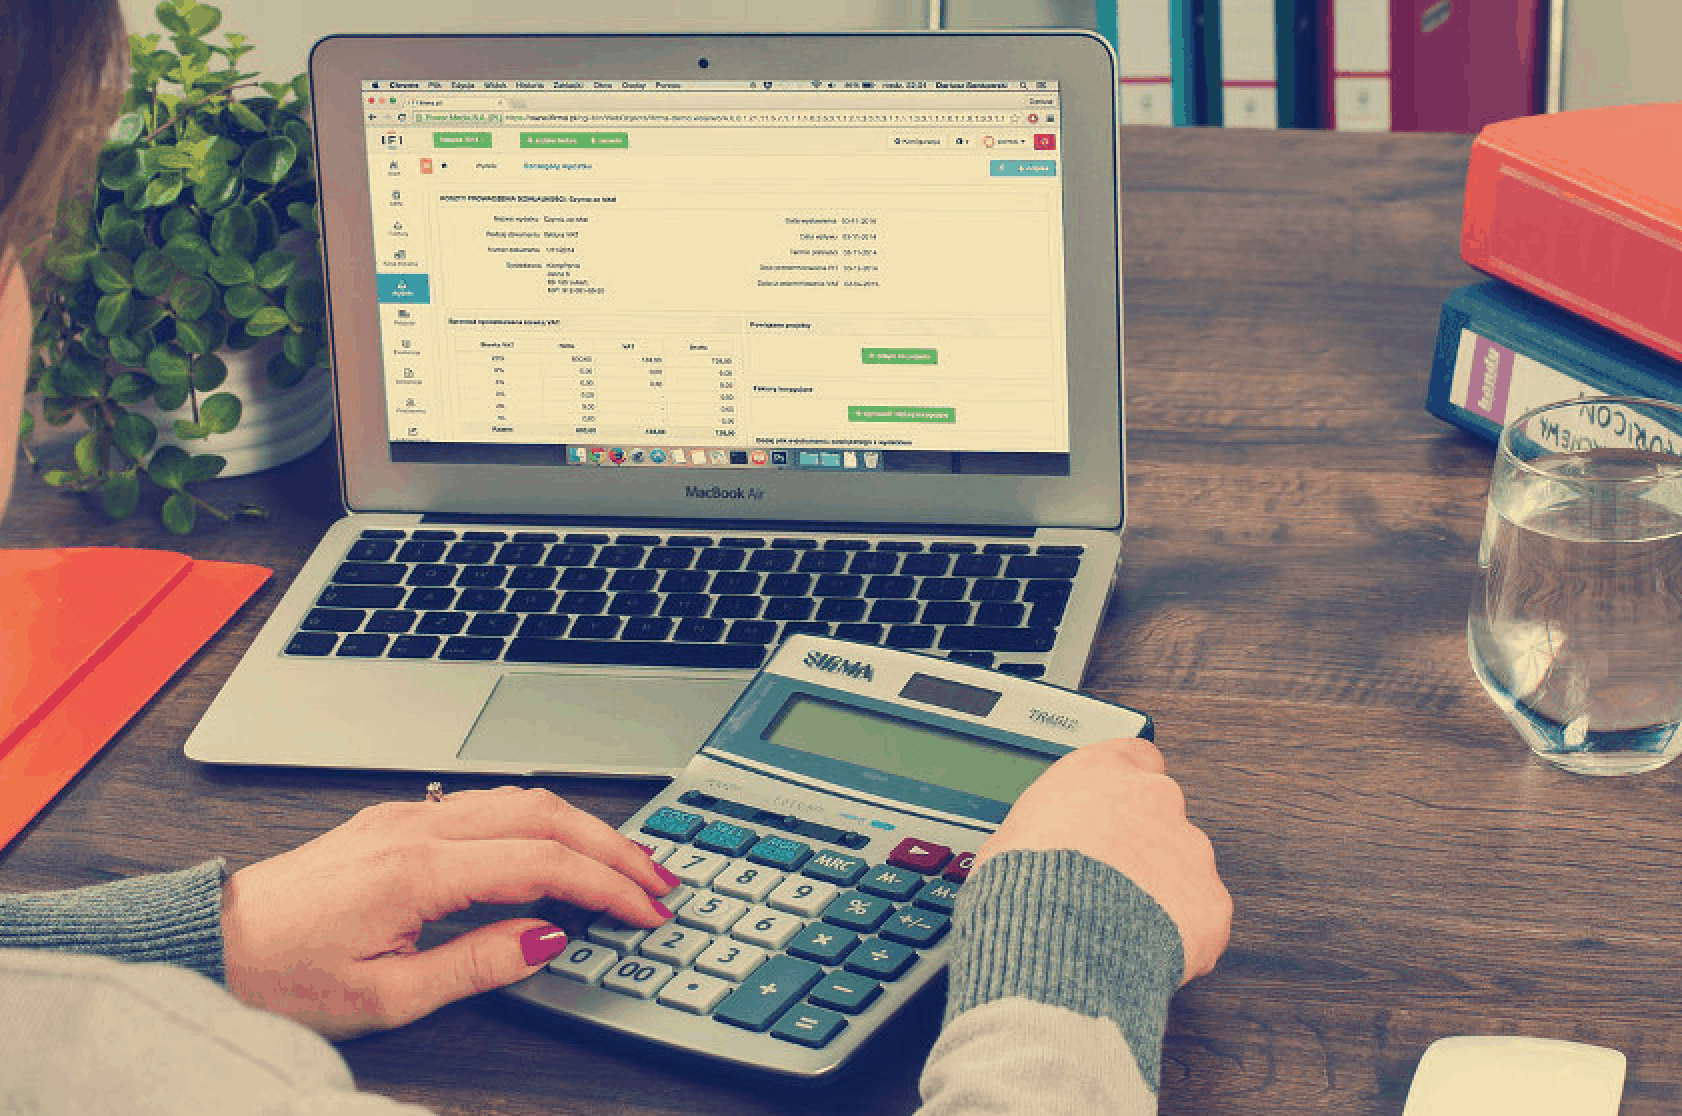 Online Calculators Make Number-Crunching as Easy as 1-2-3